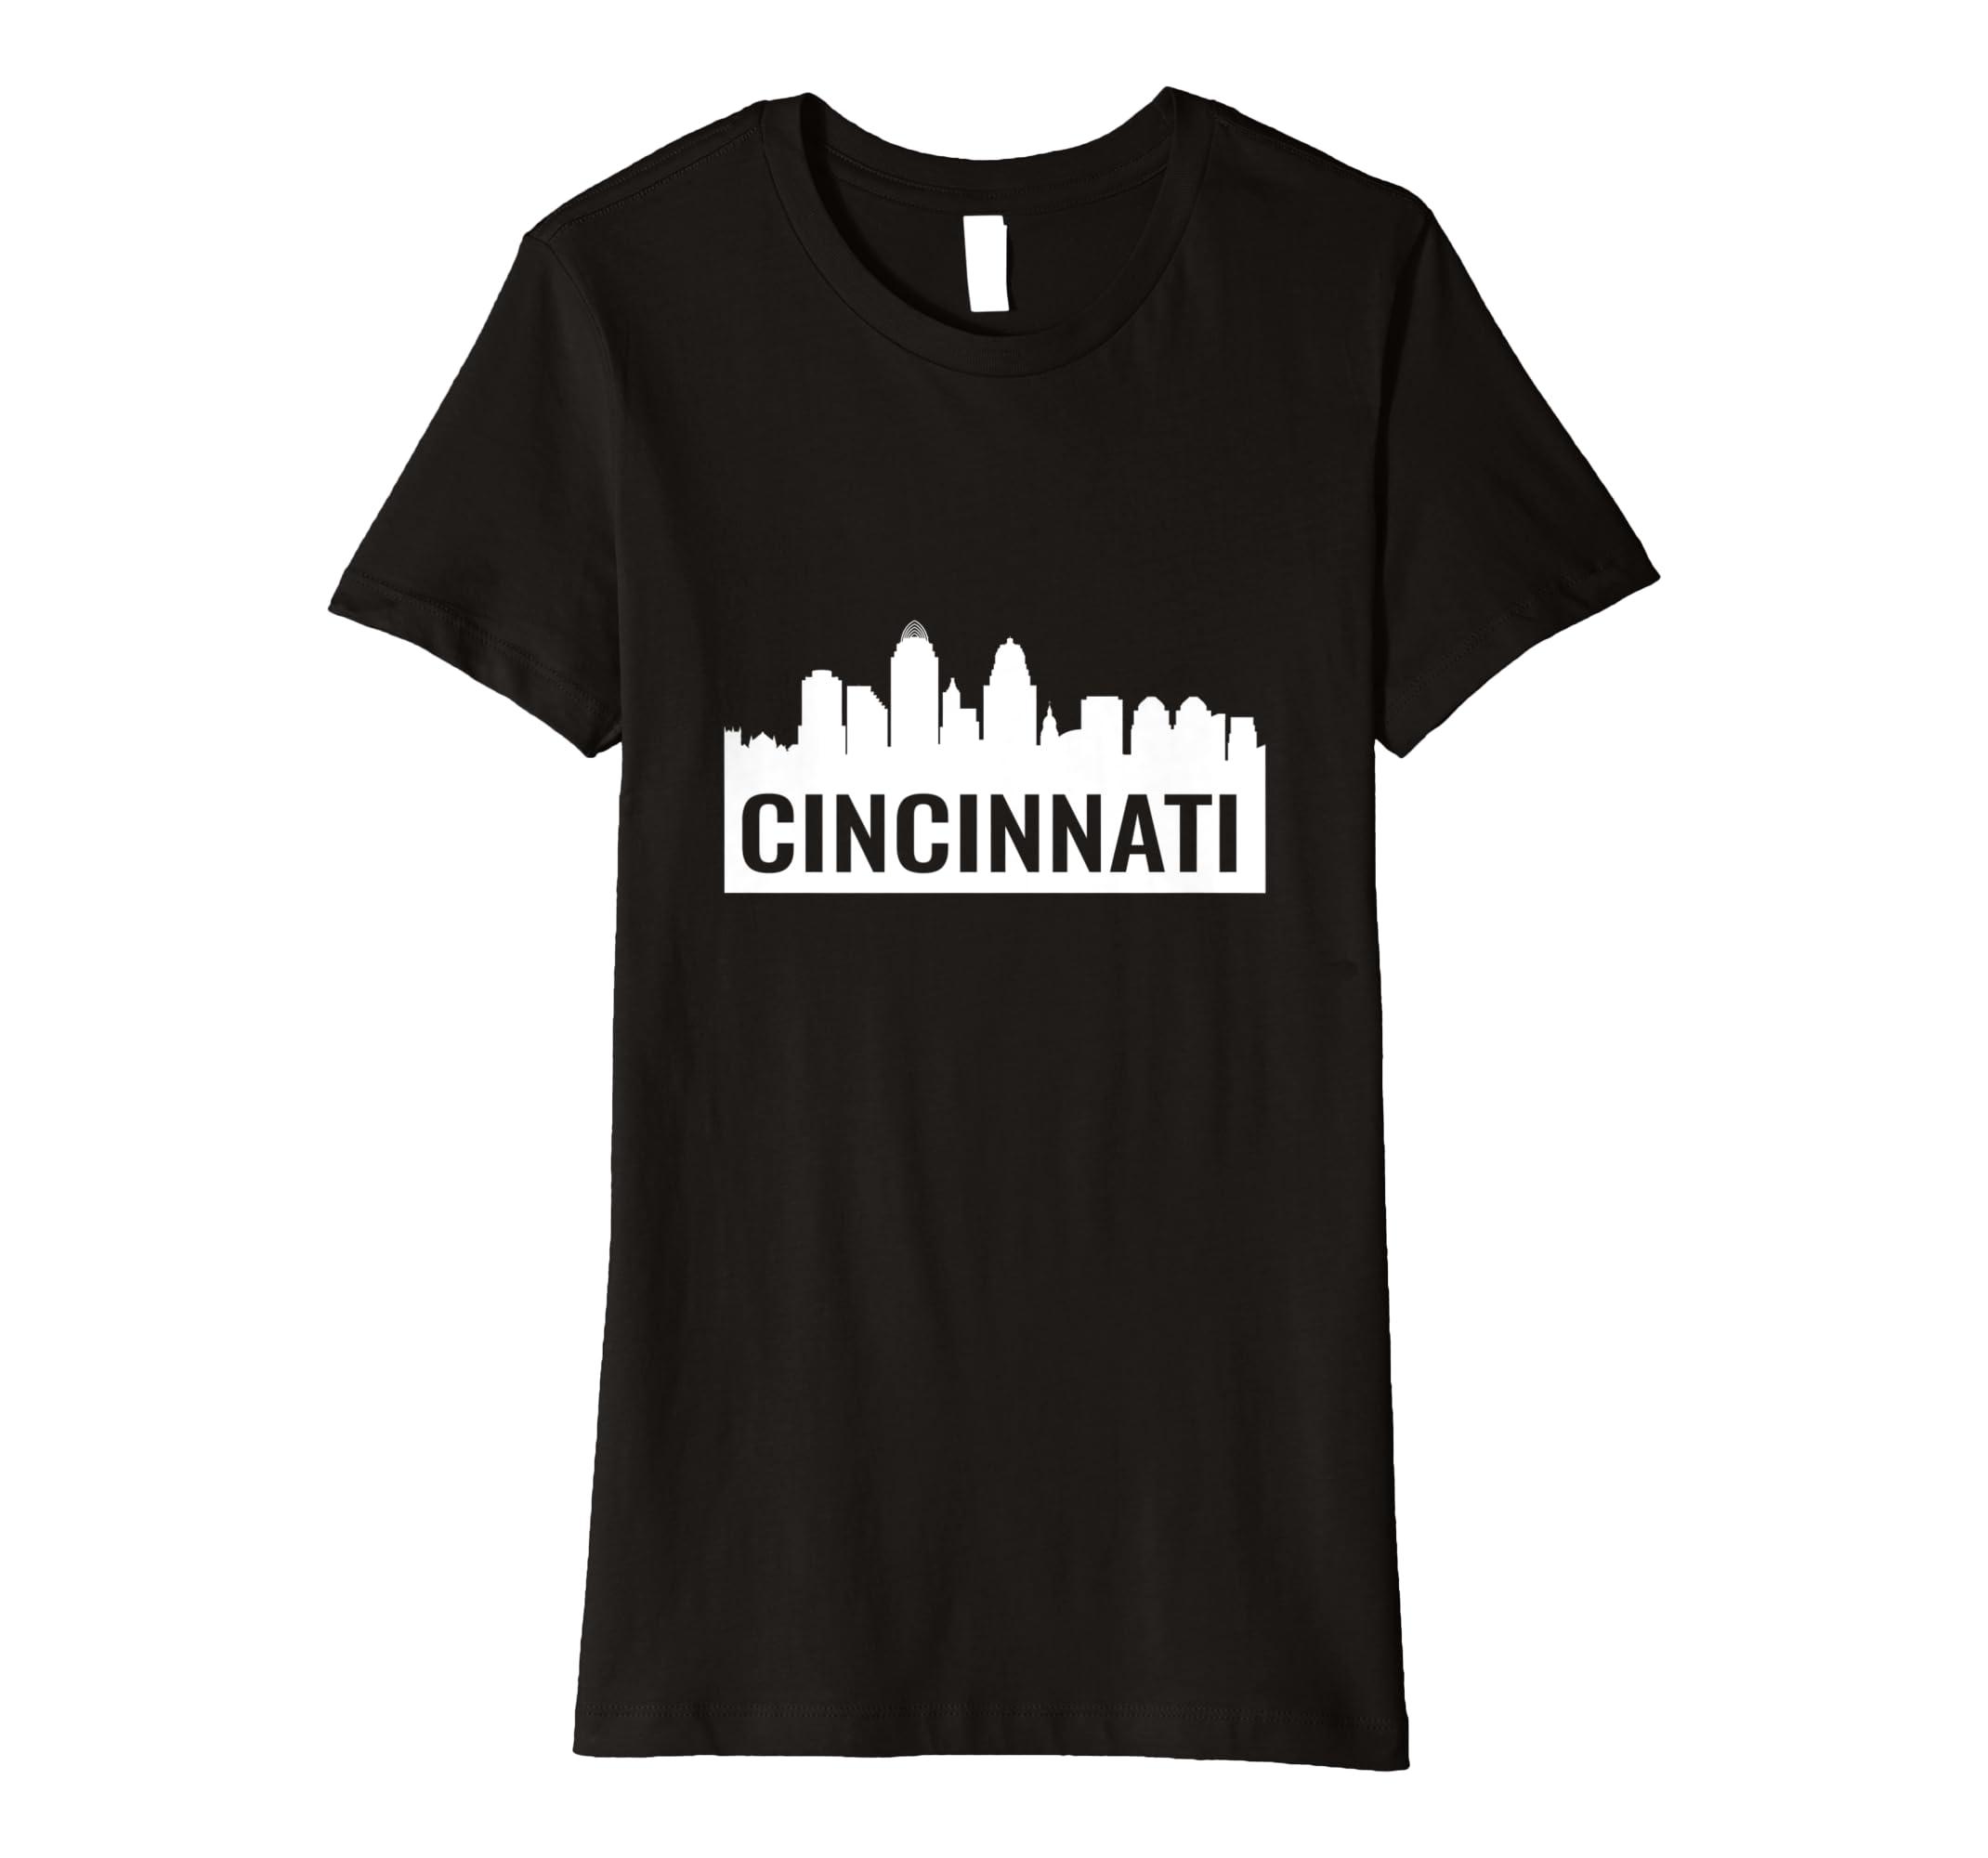 5130483e4 Amazon.com: Cincinnati Skyline T-Shirt: Clothing